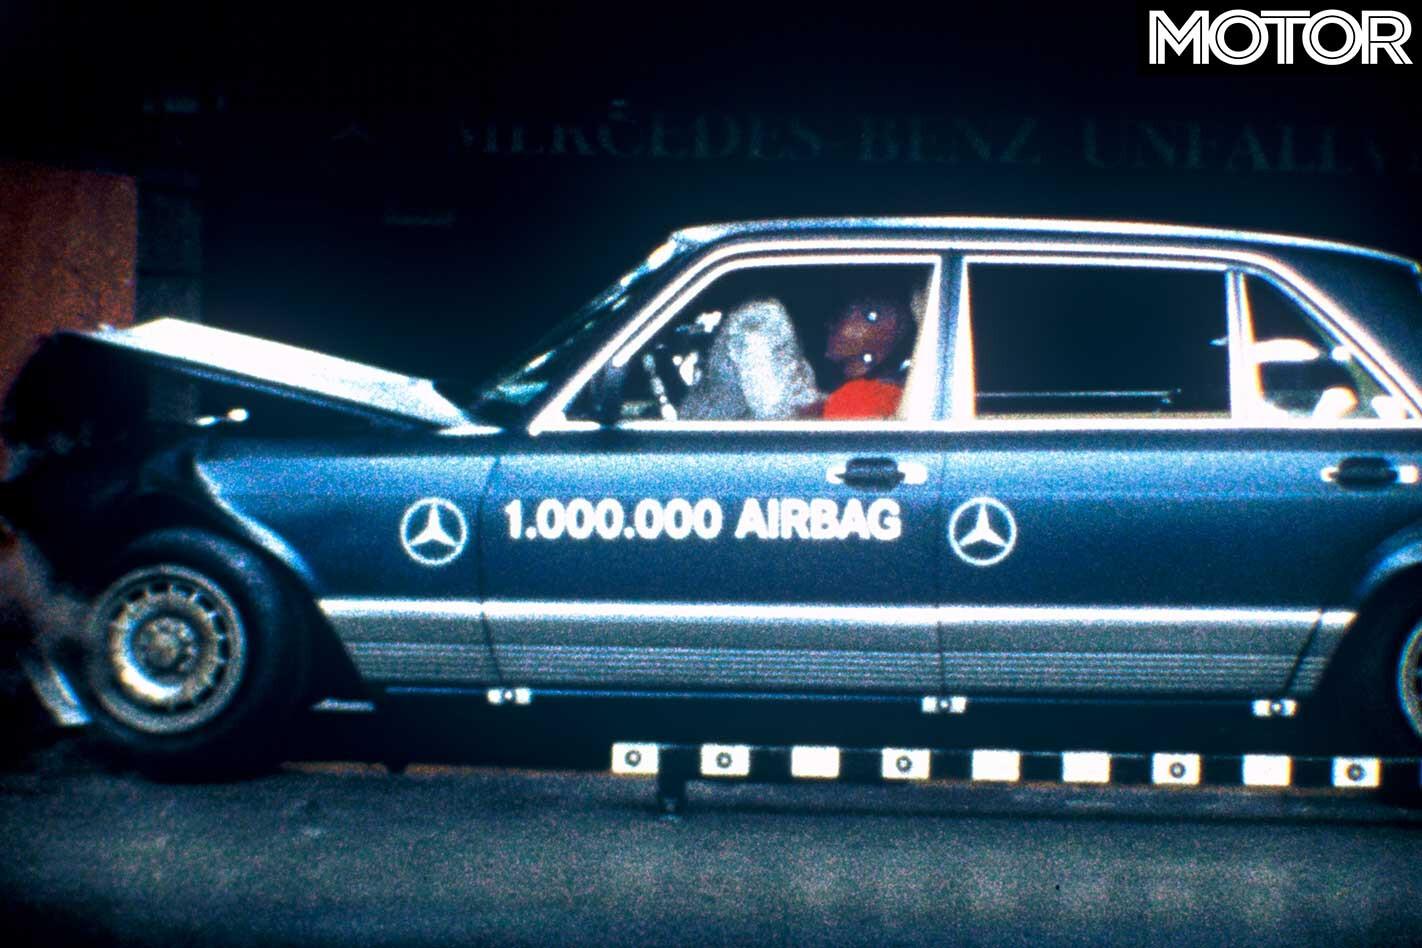 Australian Road Safety Statistics Mercedes Benz Crash Testing Jpg